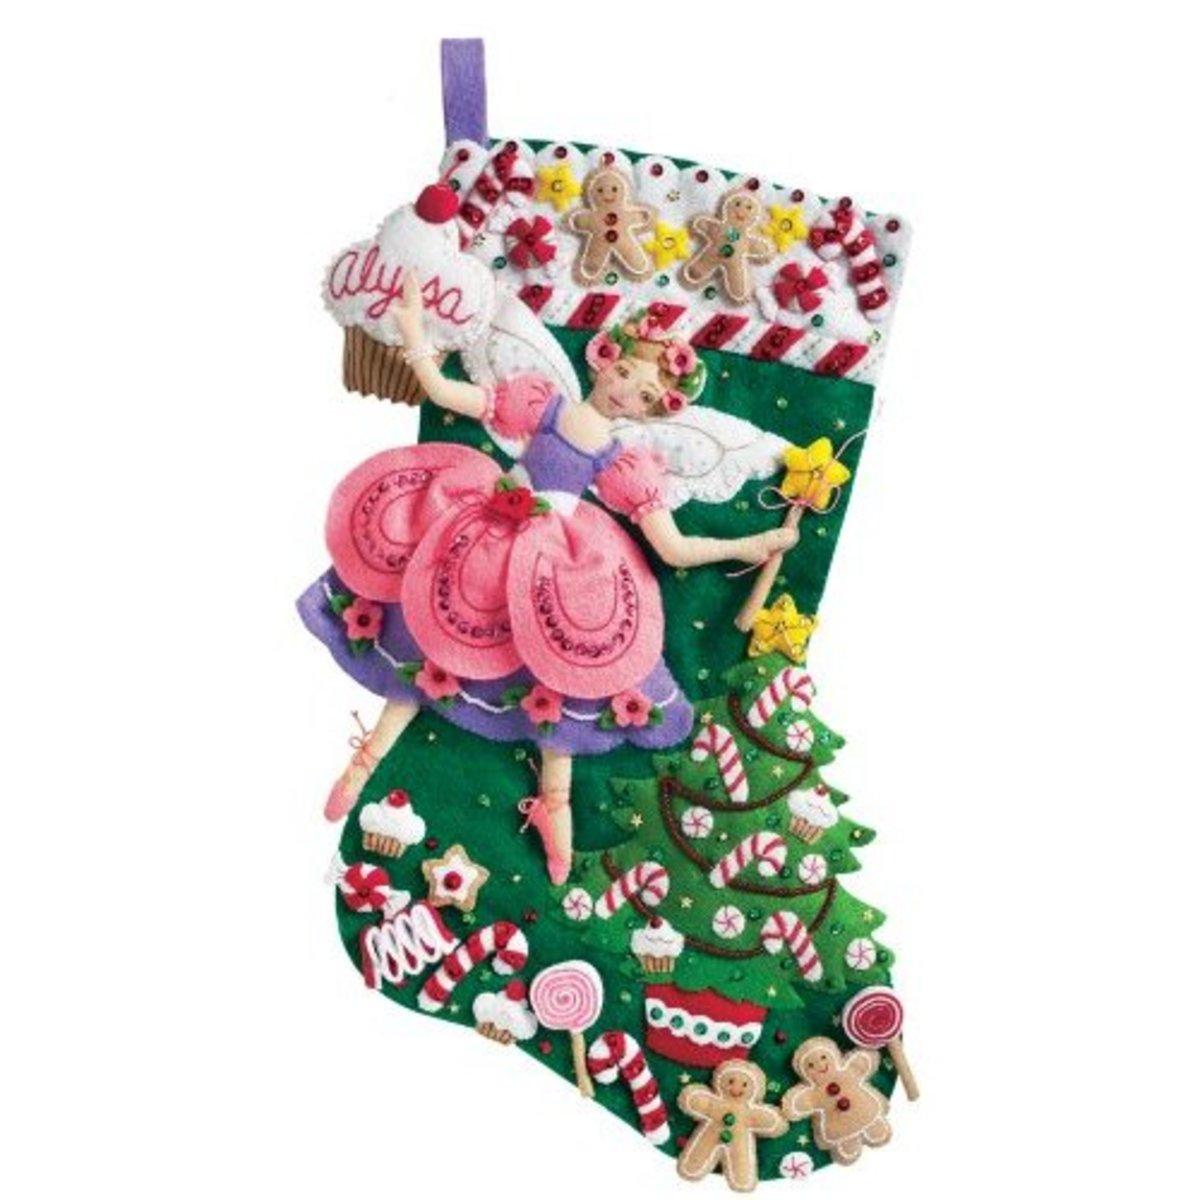 Princess Fairy machine embroidery applique designs magical